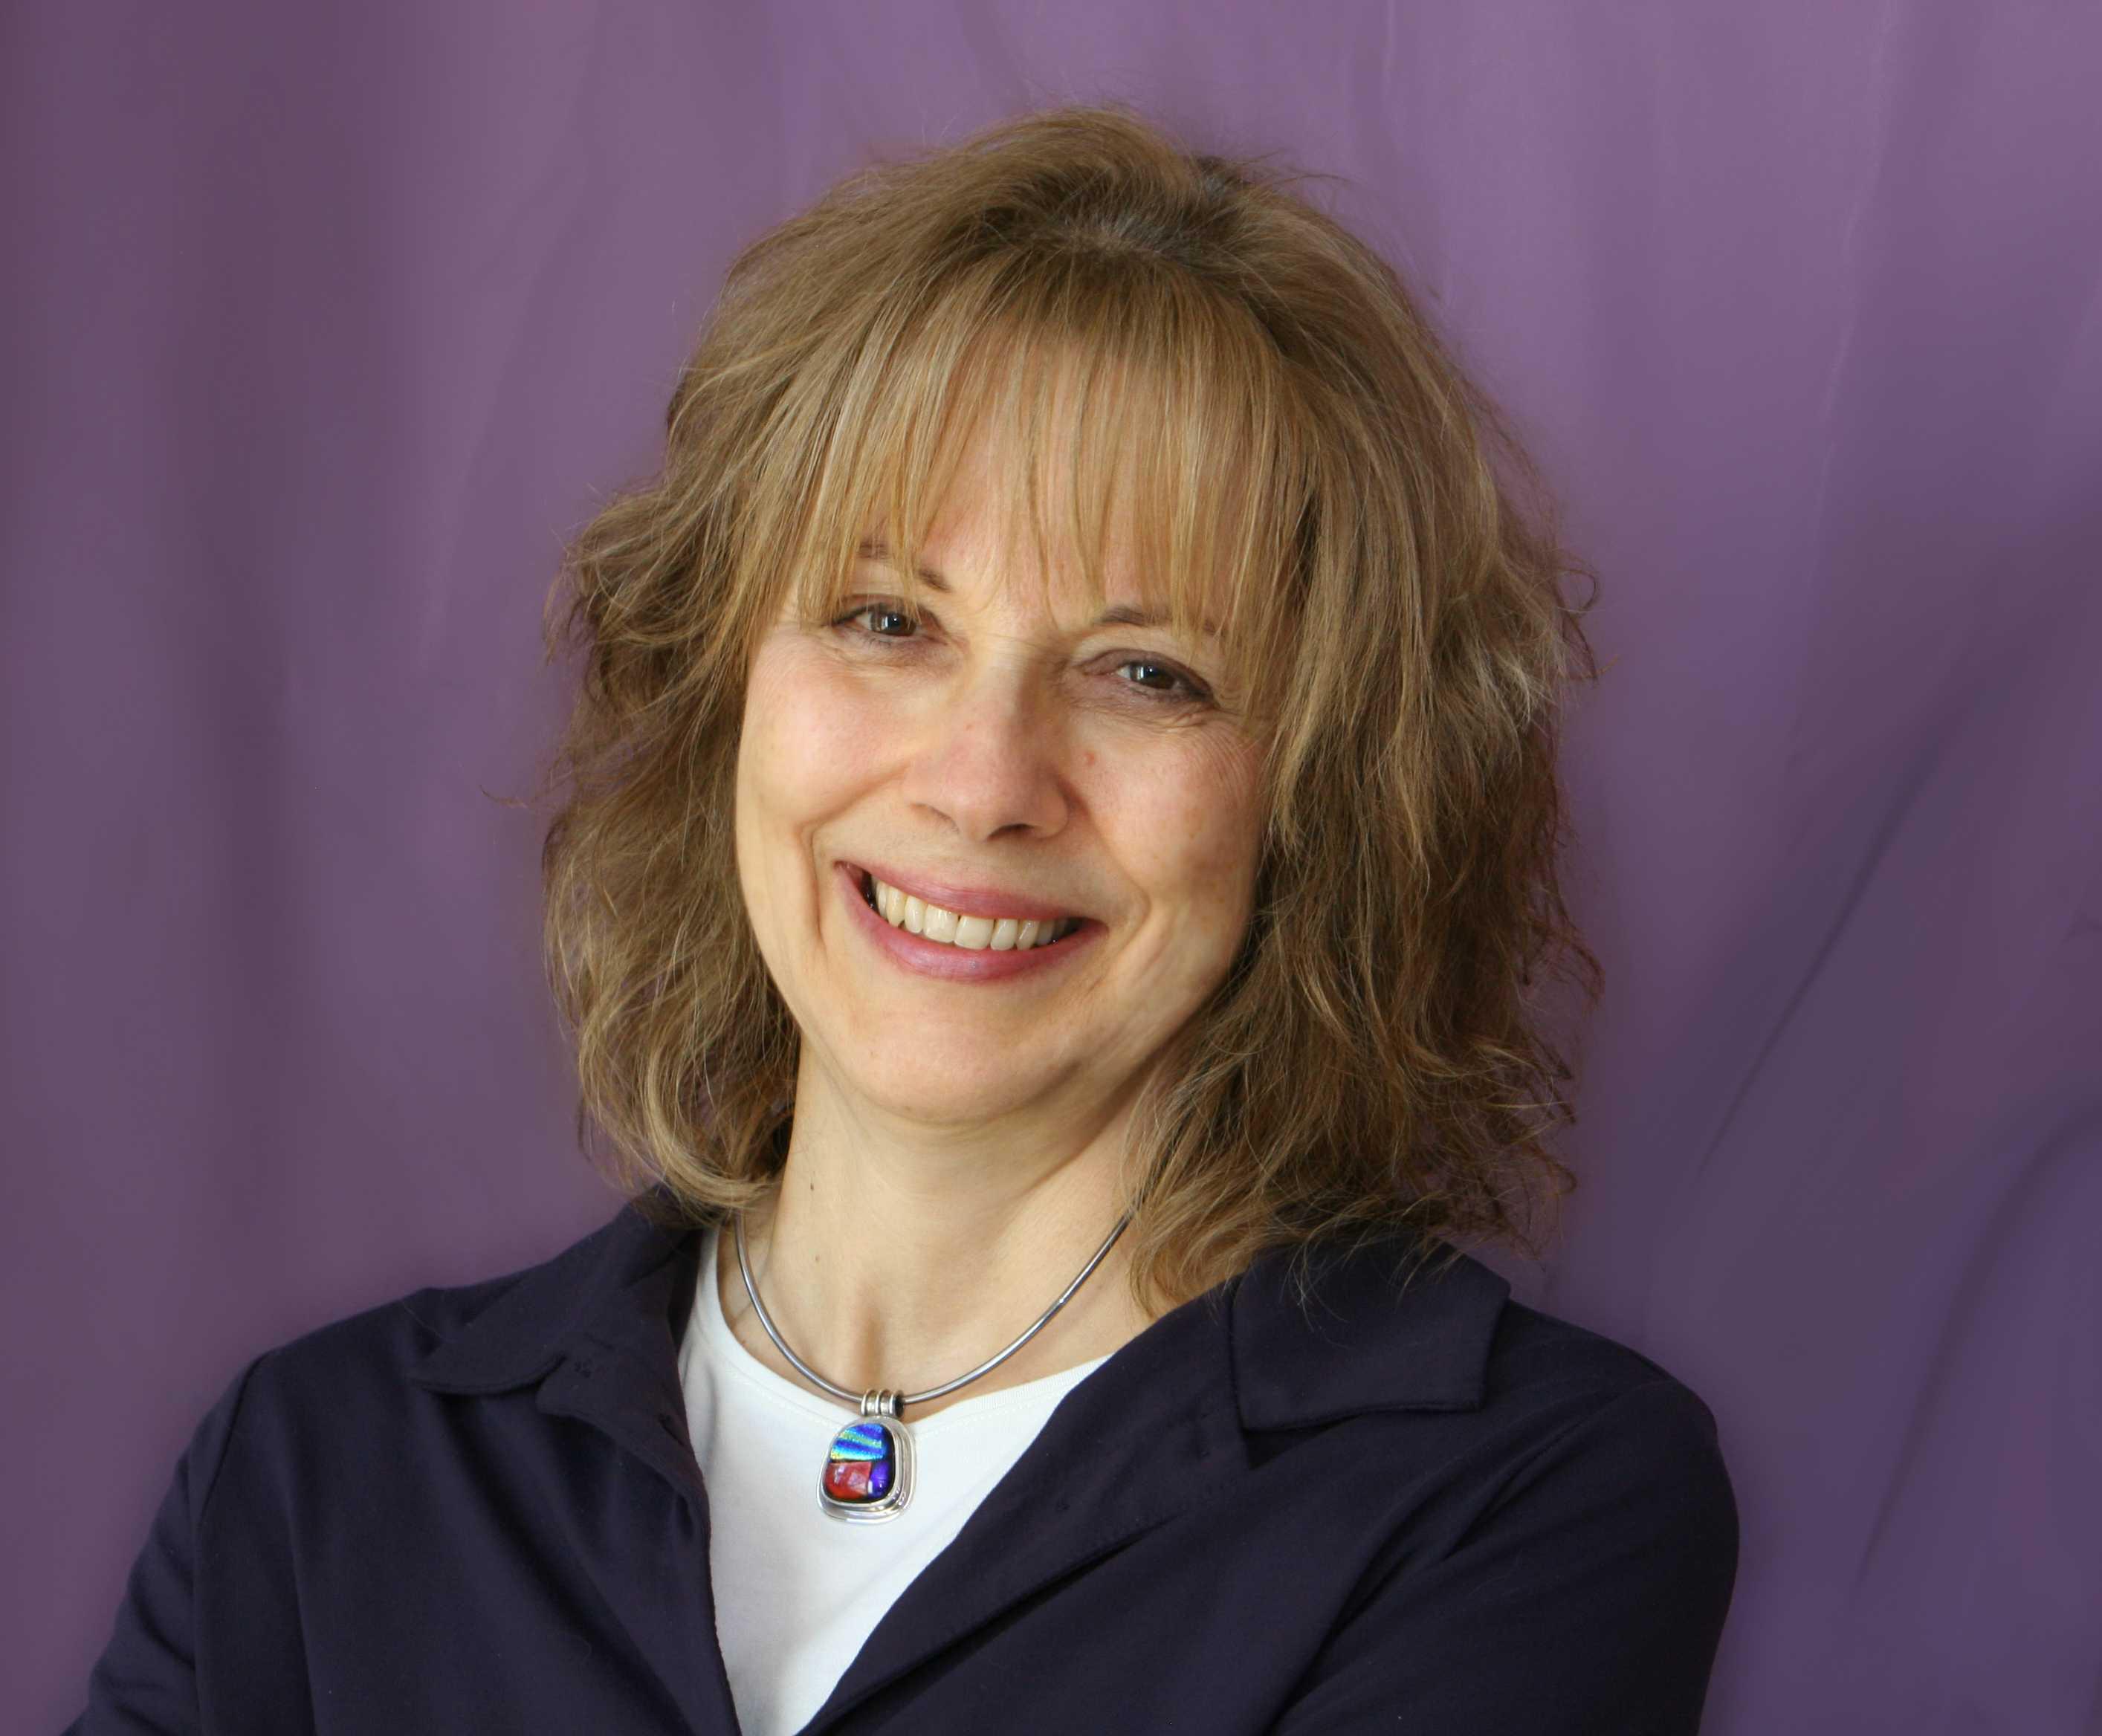 Gina Genest/ The Mindful Zone, LLC